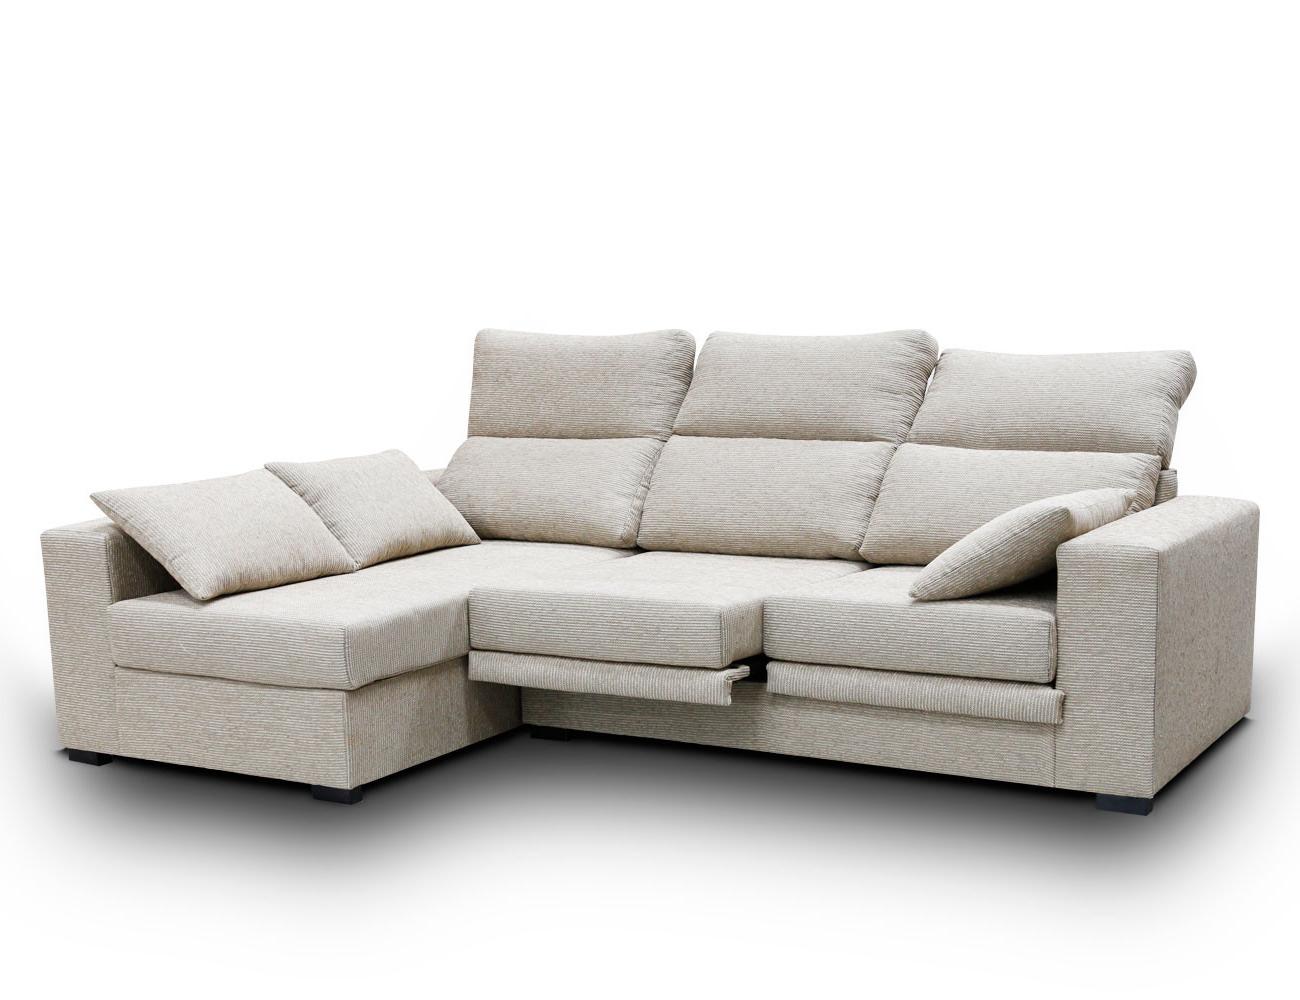 Sofas Chaise Longue Baratos Fmdf Grand sofas Chaise Longue Baratos 10